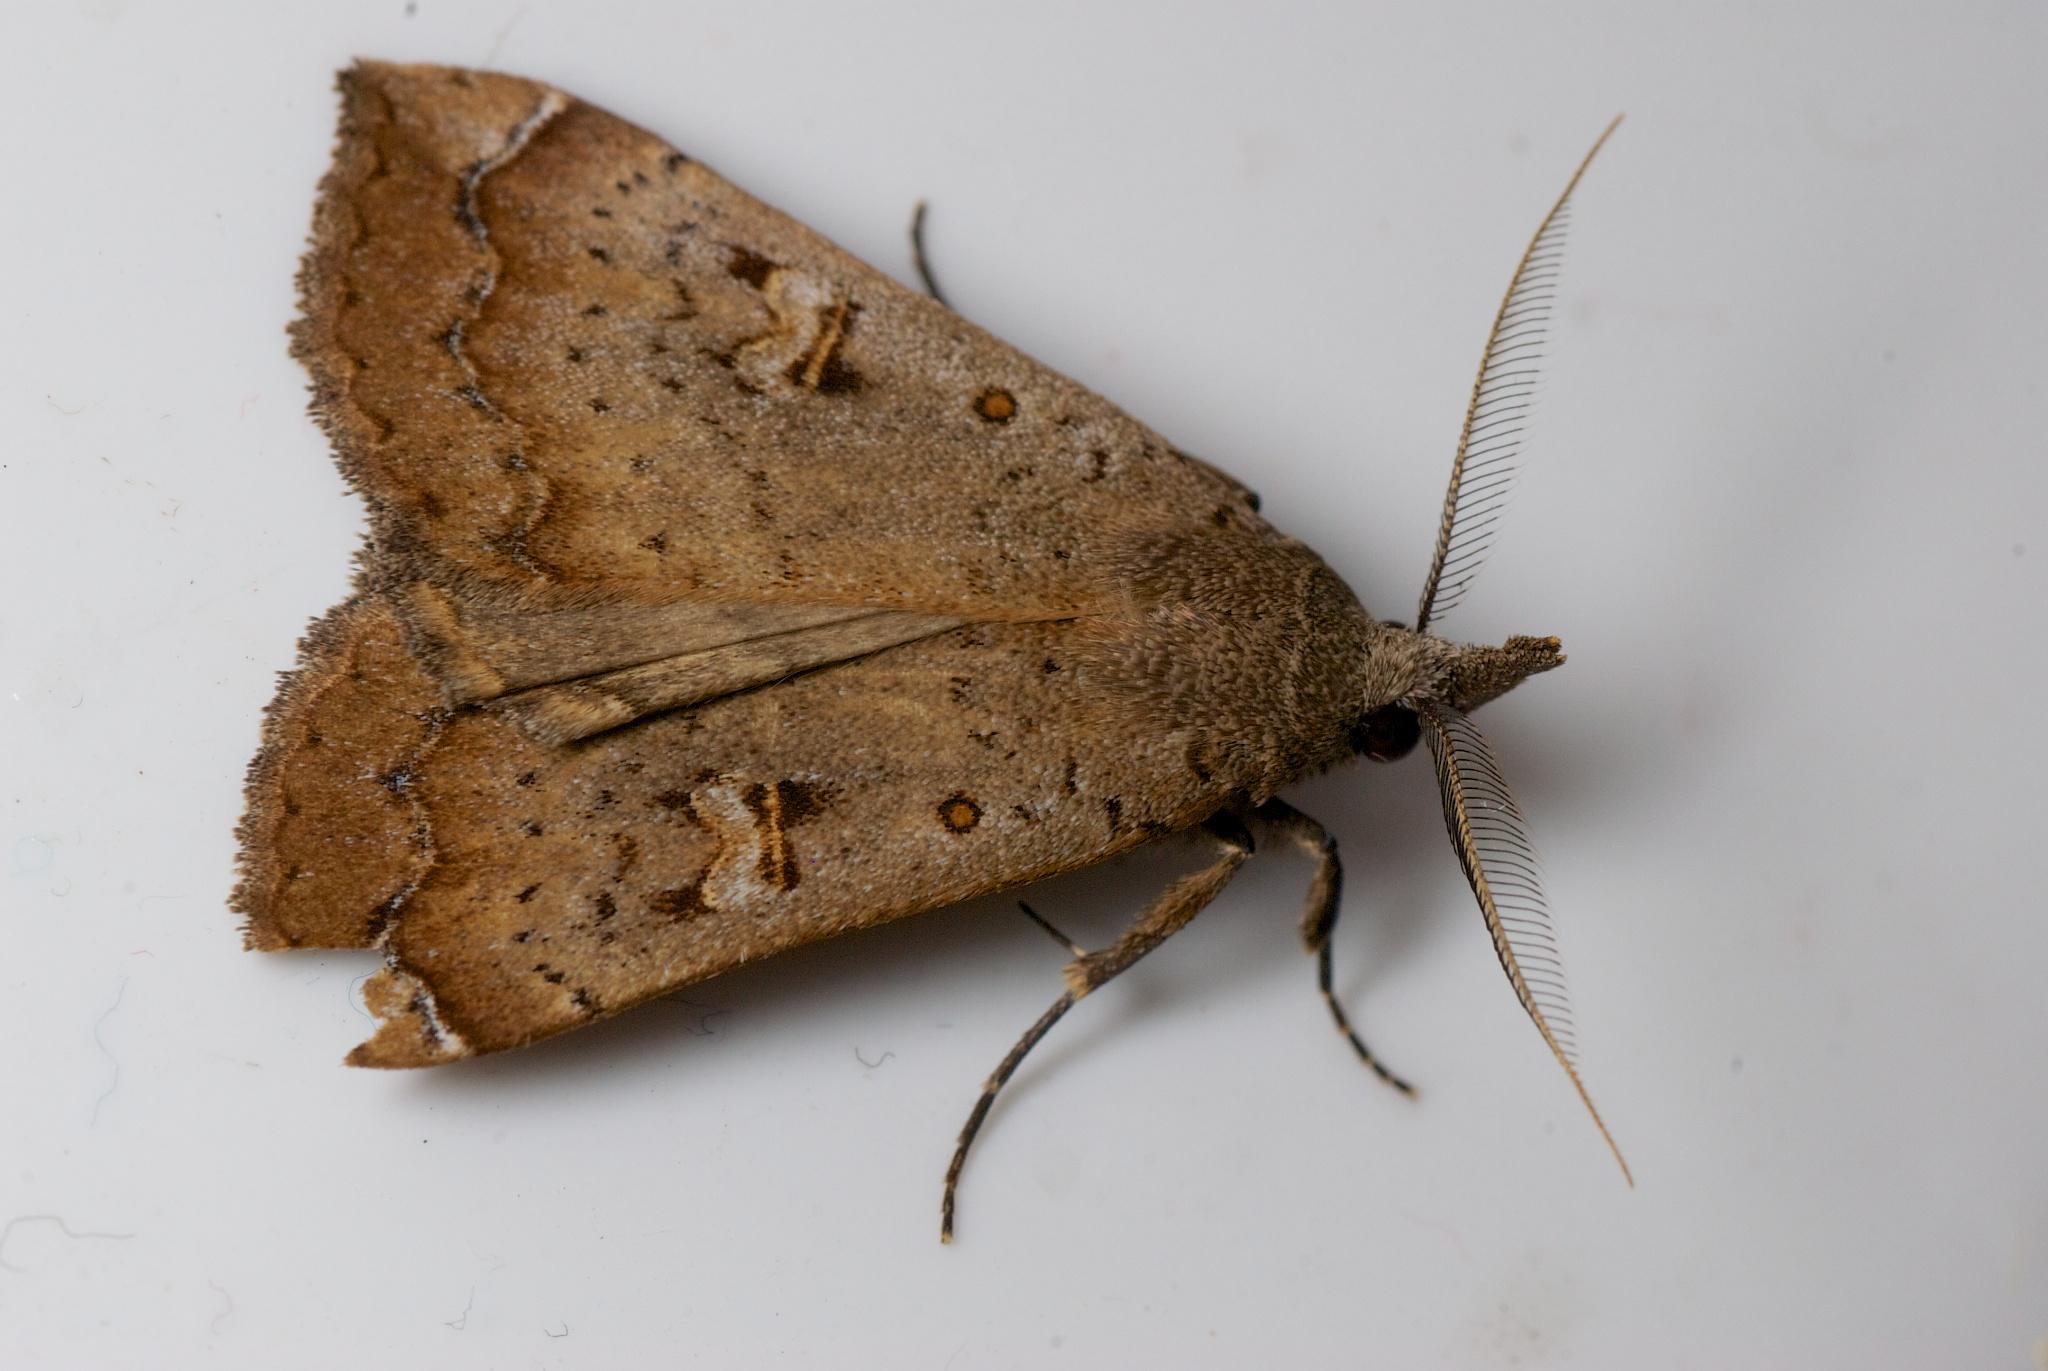 Moth in the bathroom explore mollivan jon39s photos on for Tiny moths in bathroom